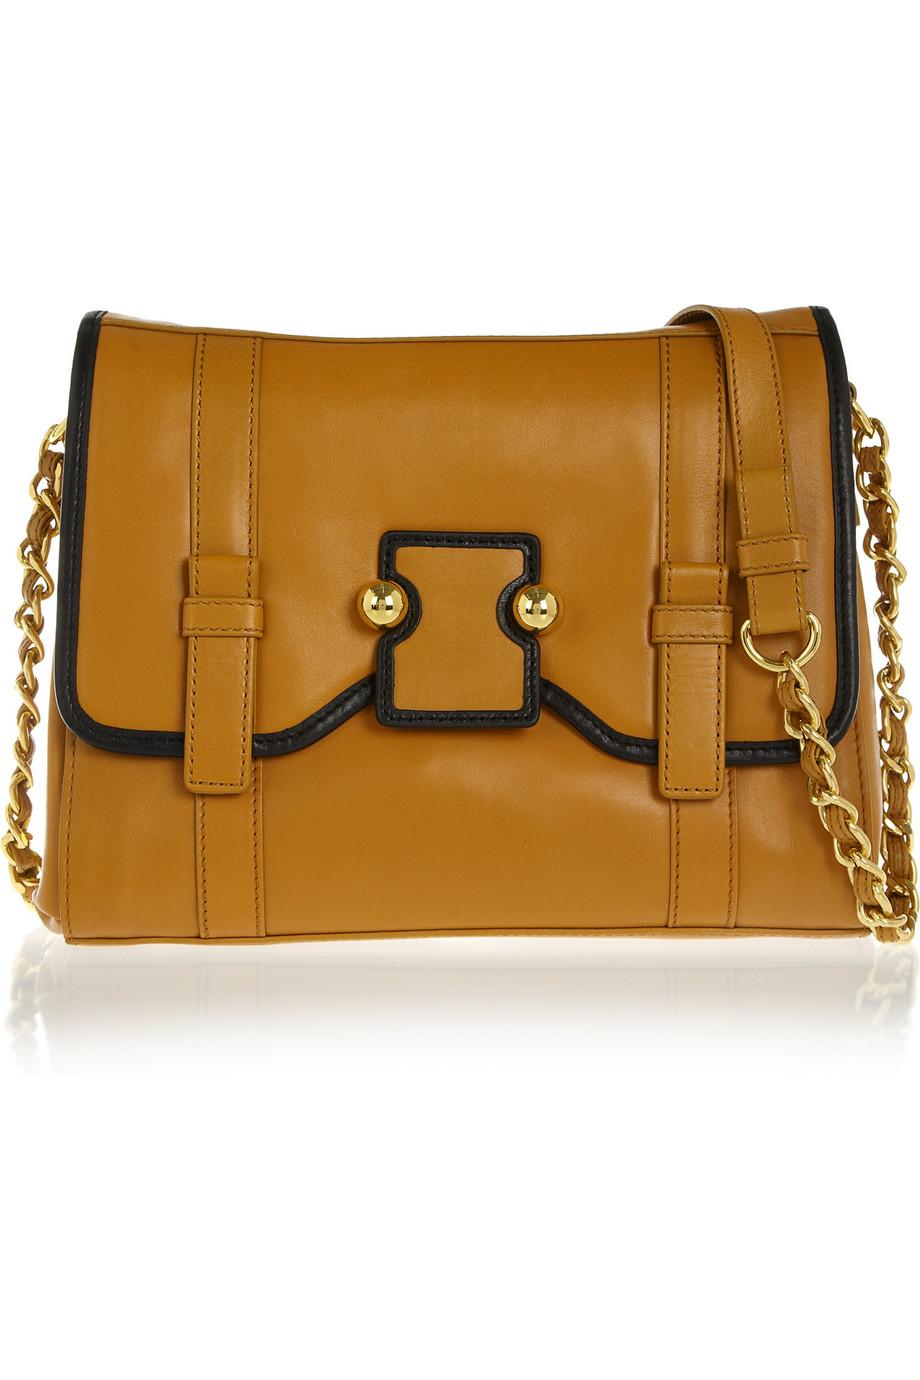 botkier crossbody bag boho crossbody bag womens crossbody bag crossbody bag for girls